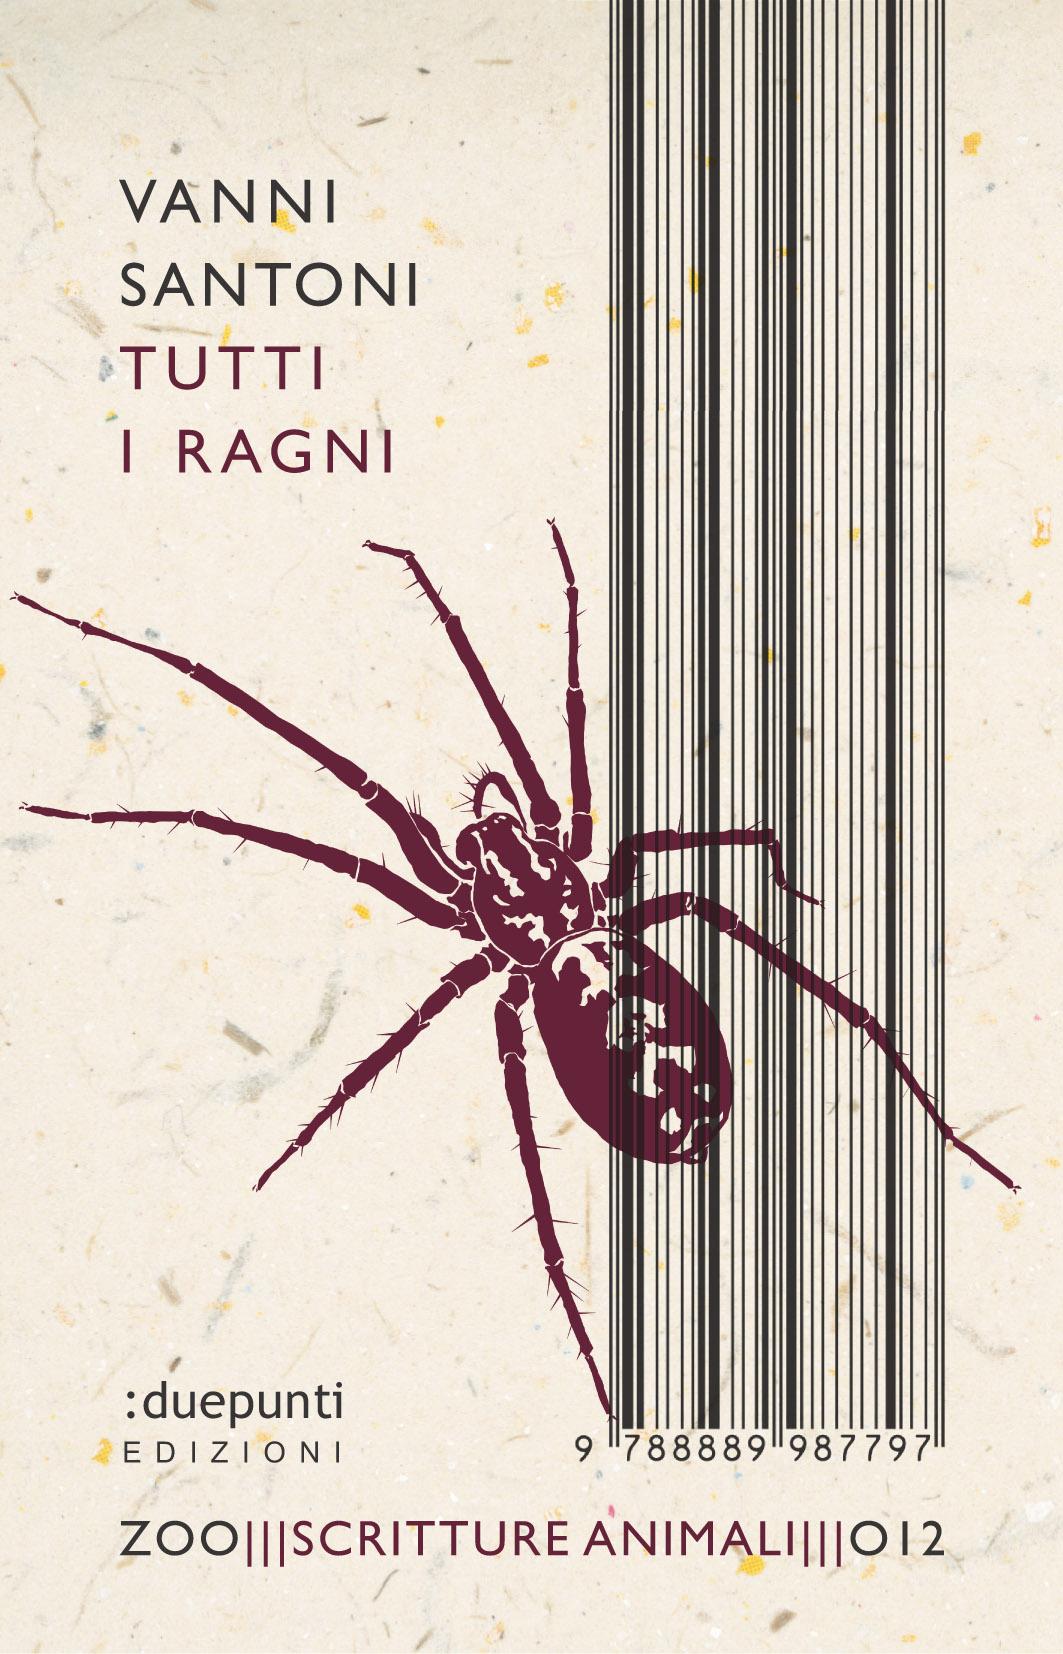 Tutti i ragni